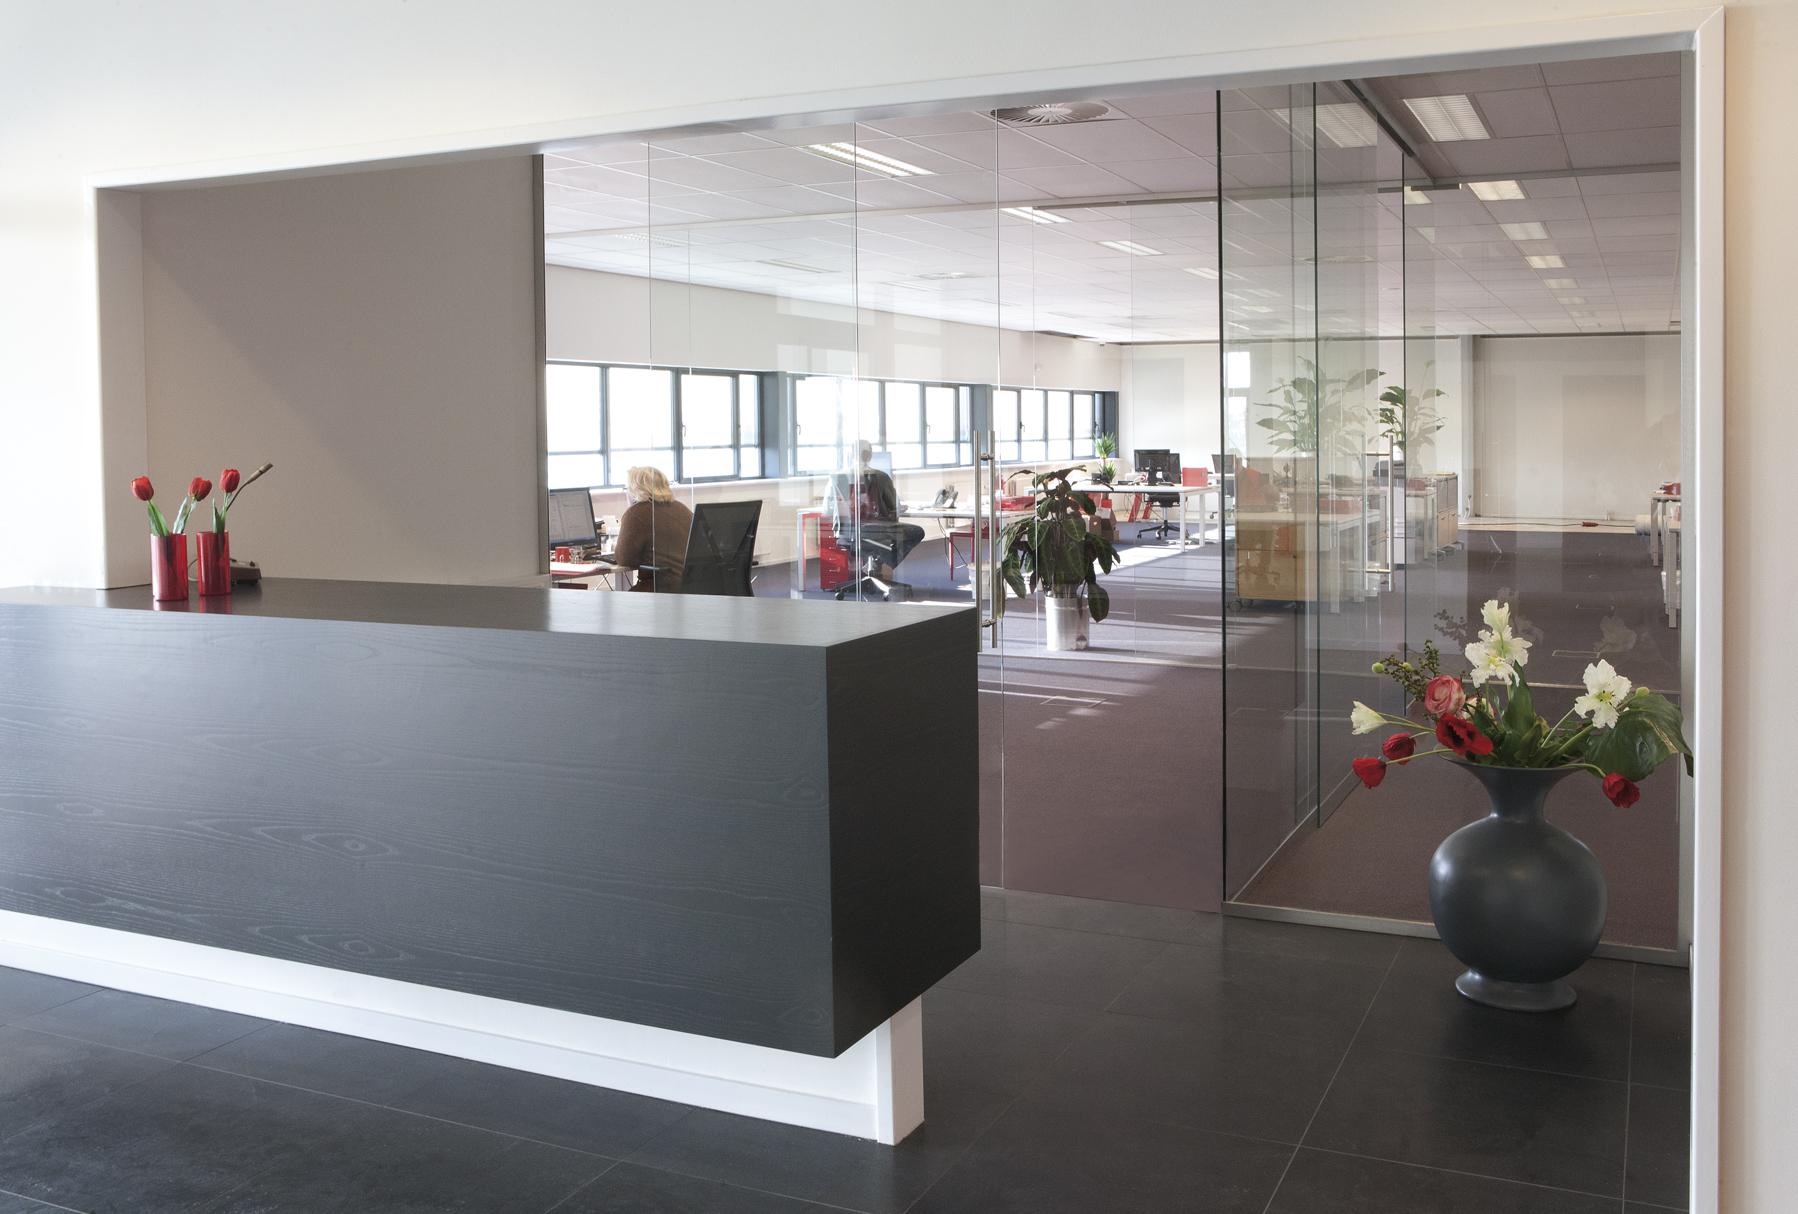 Glazen wand kantoor Hilversum